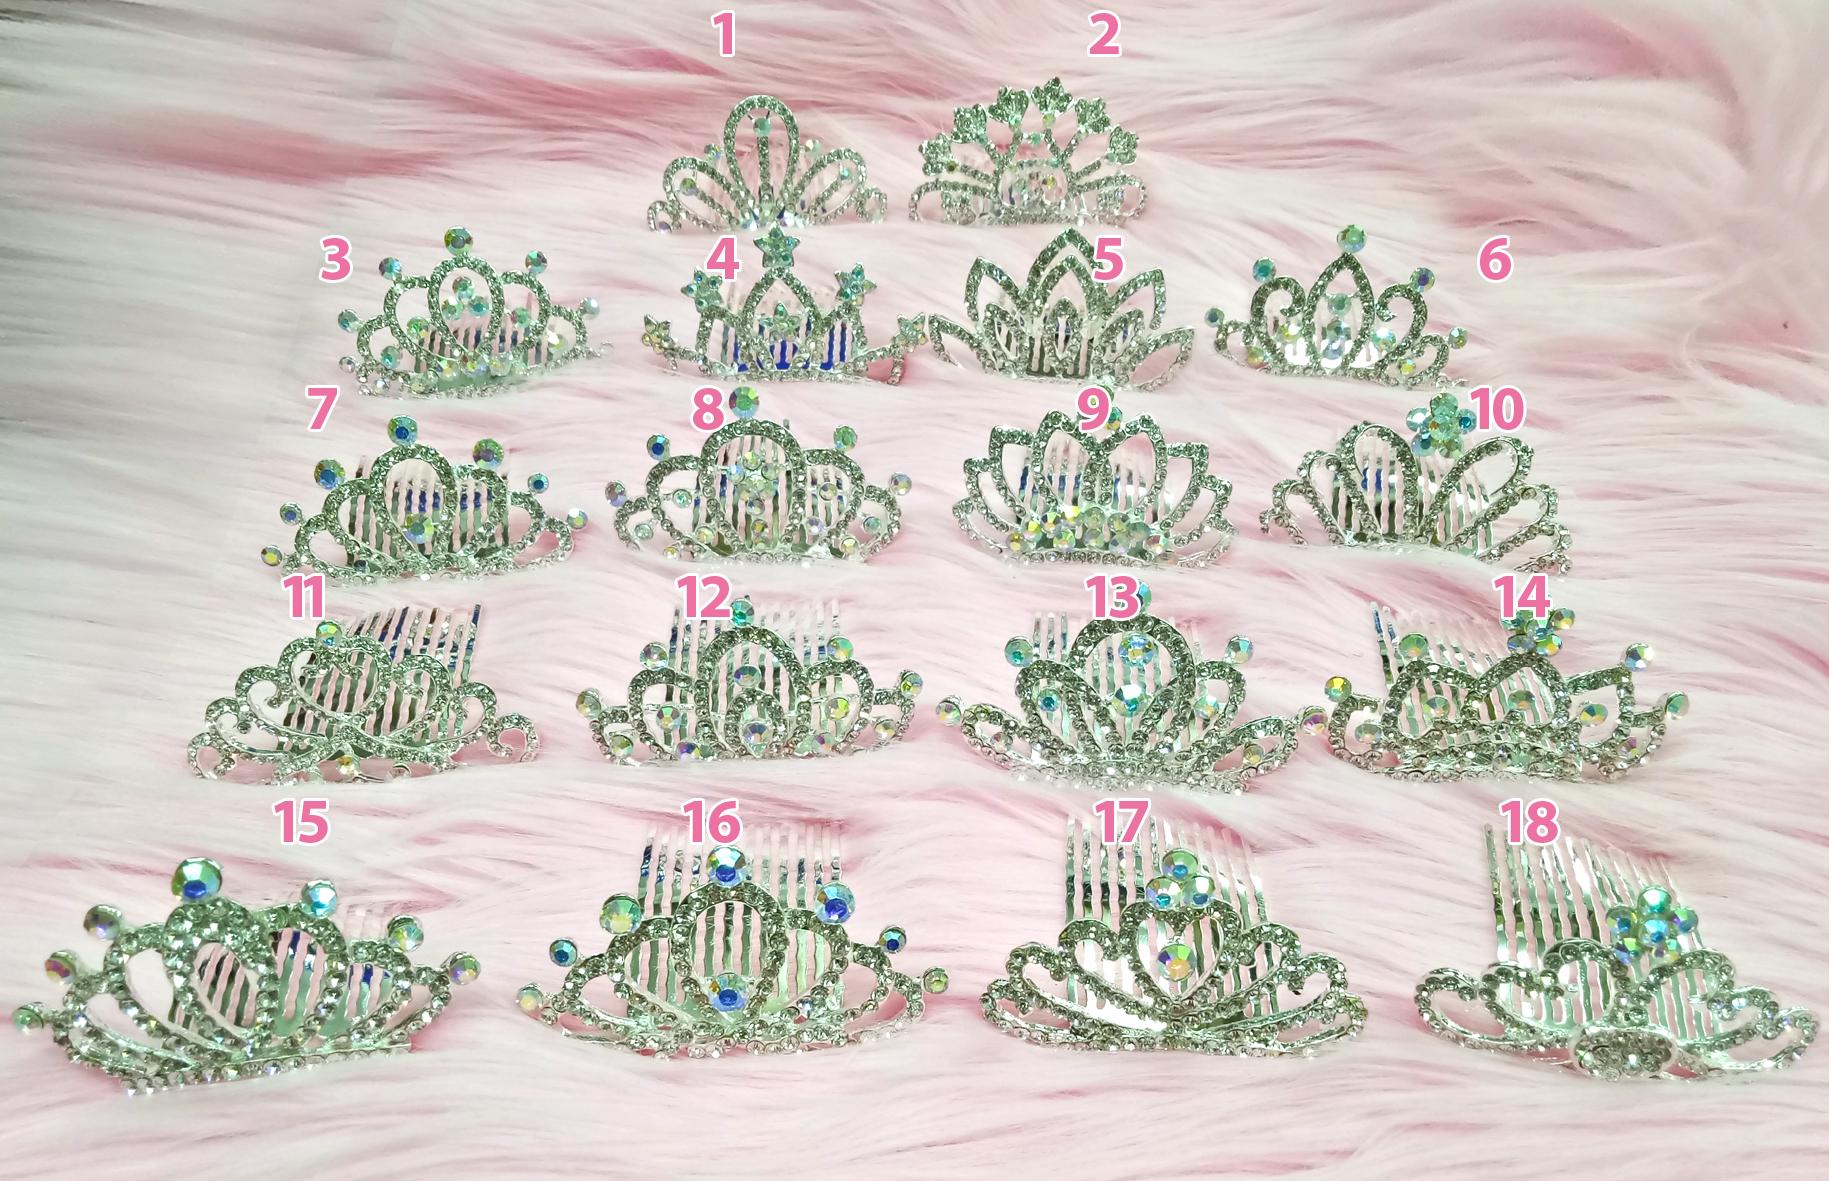 Sirkam Mahkota Ryuuta Wig Hair Extensions Accessories Hello Kitty Sisir Aksesoris